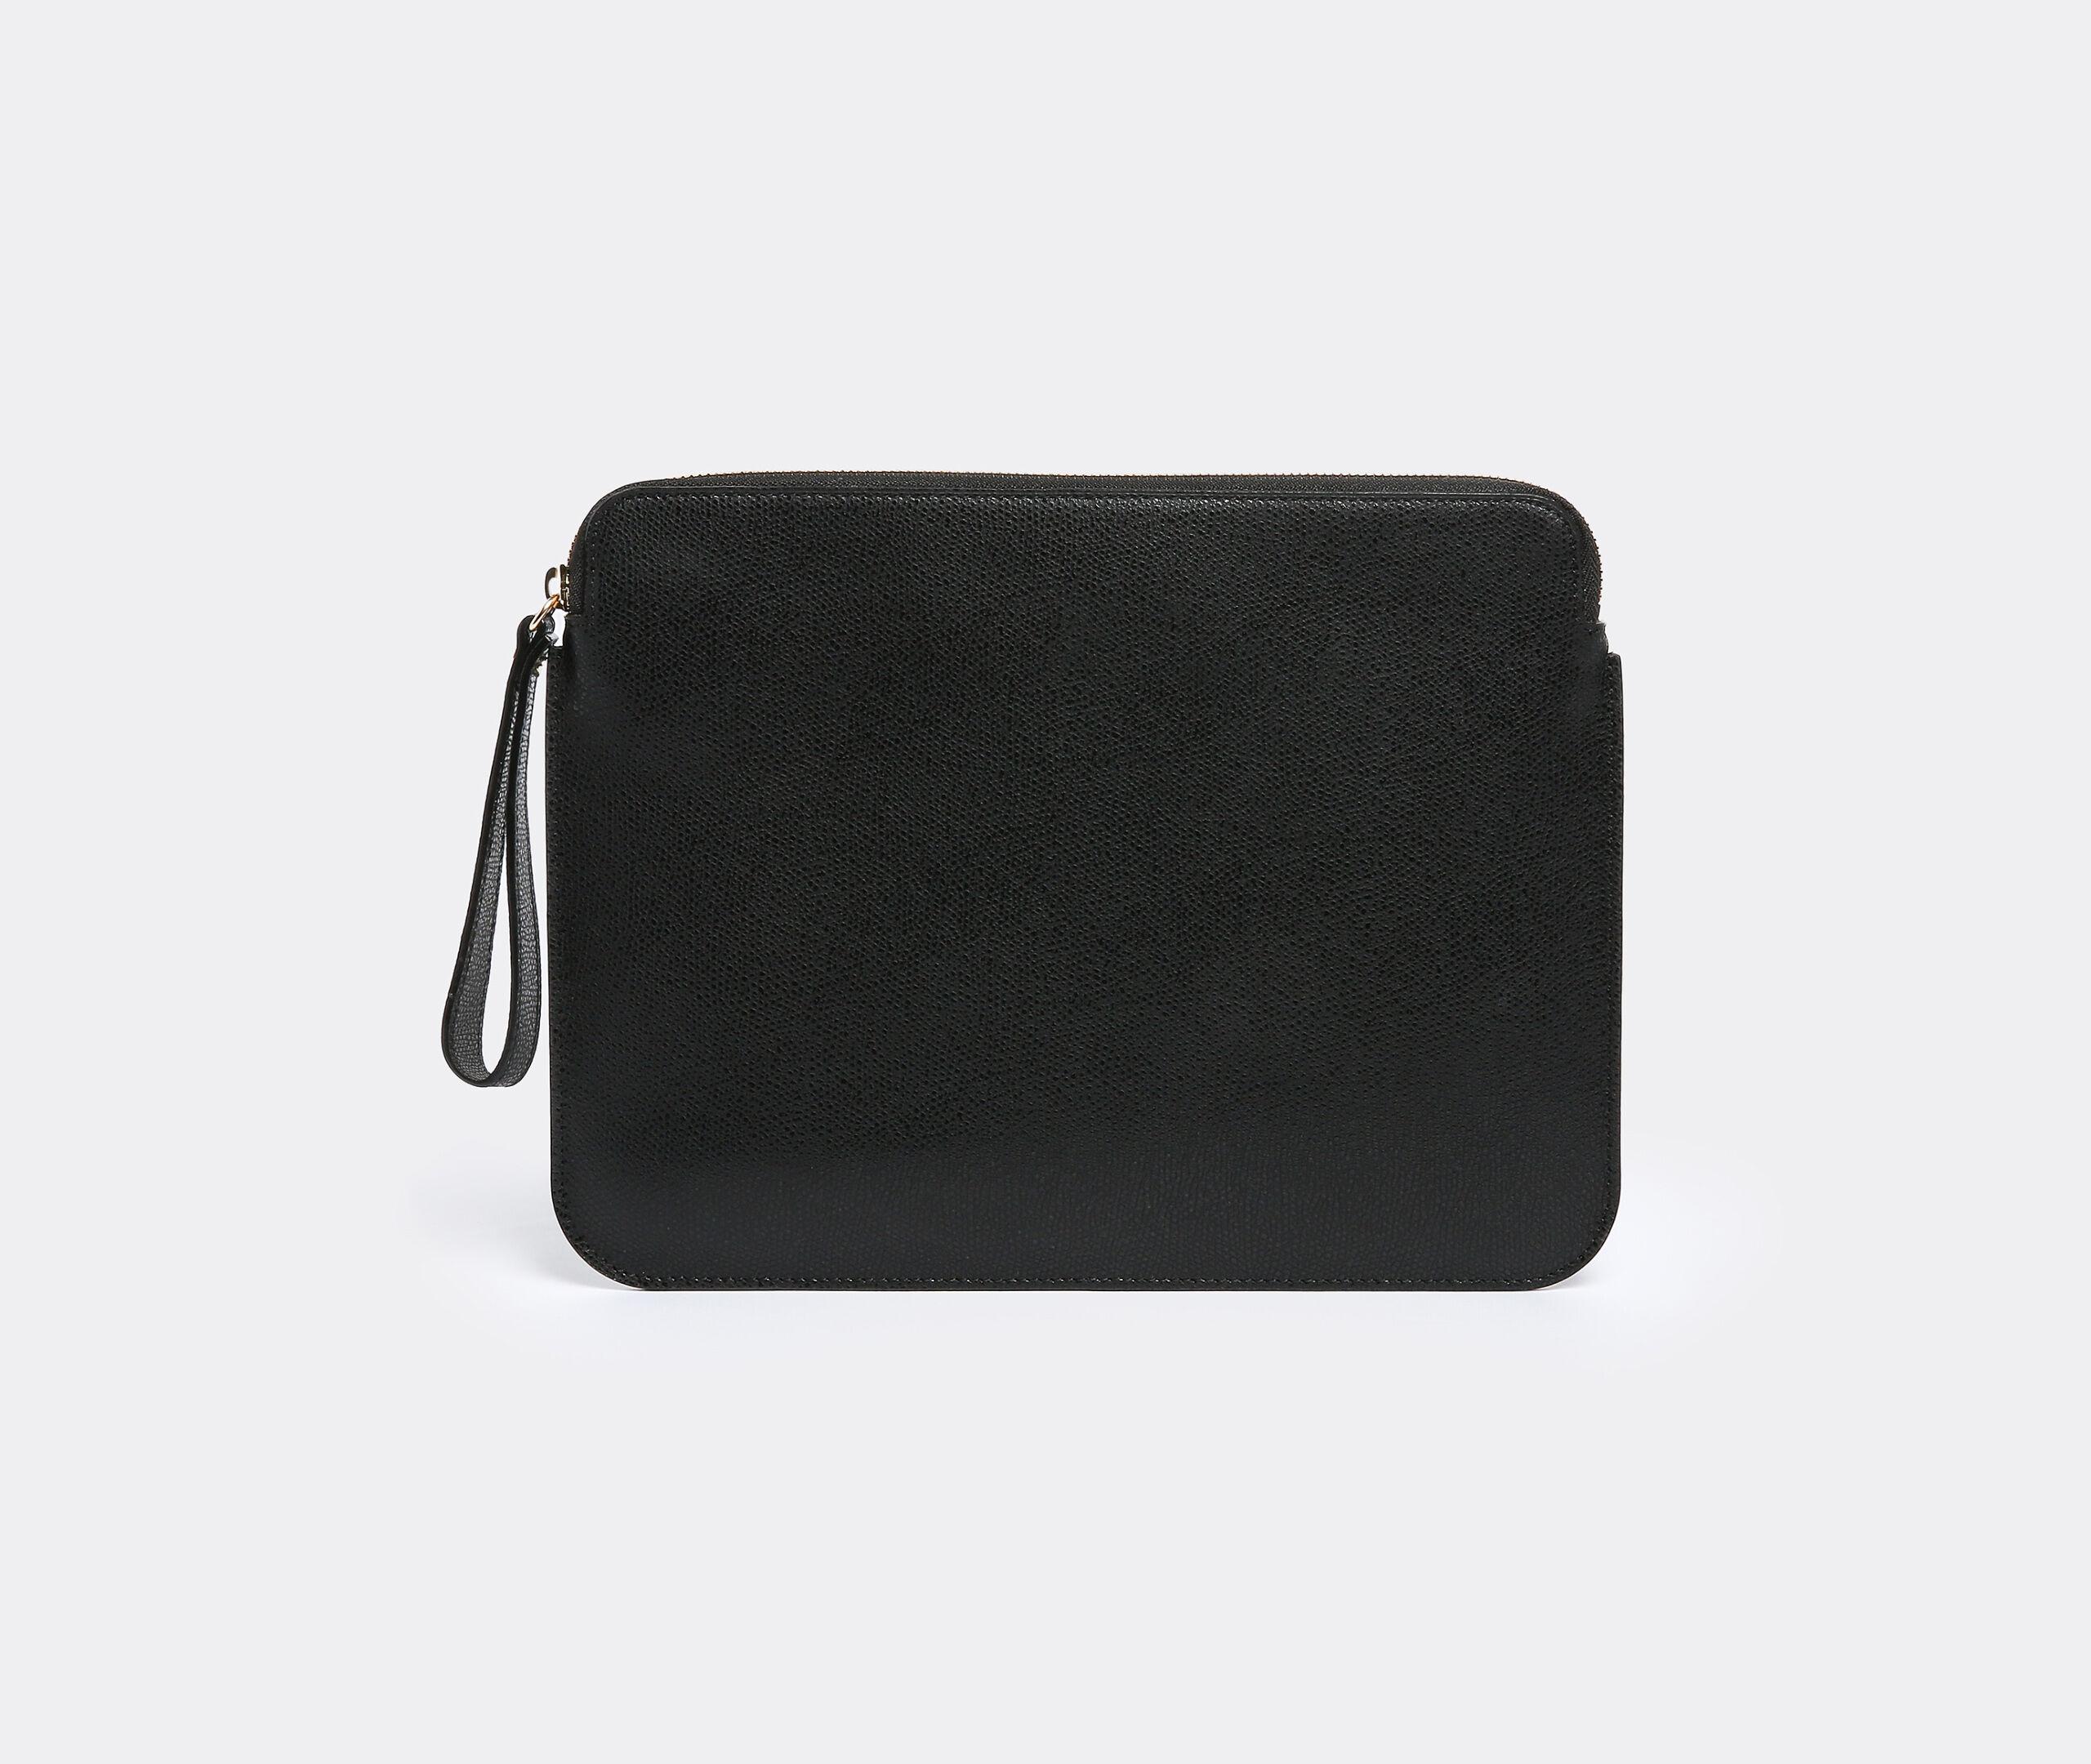 Ipad Cover With Zip